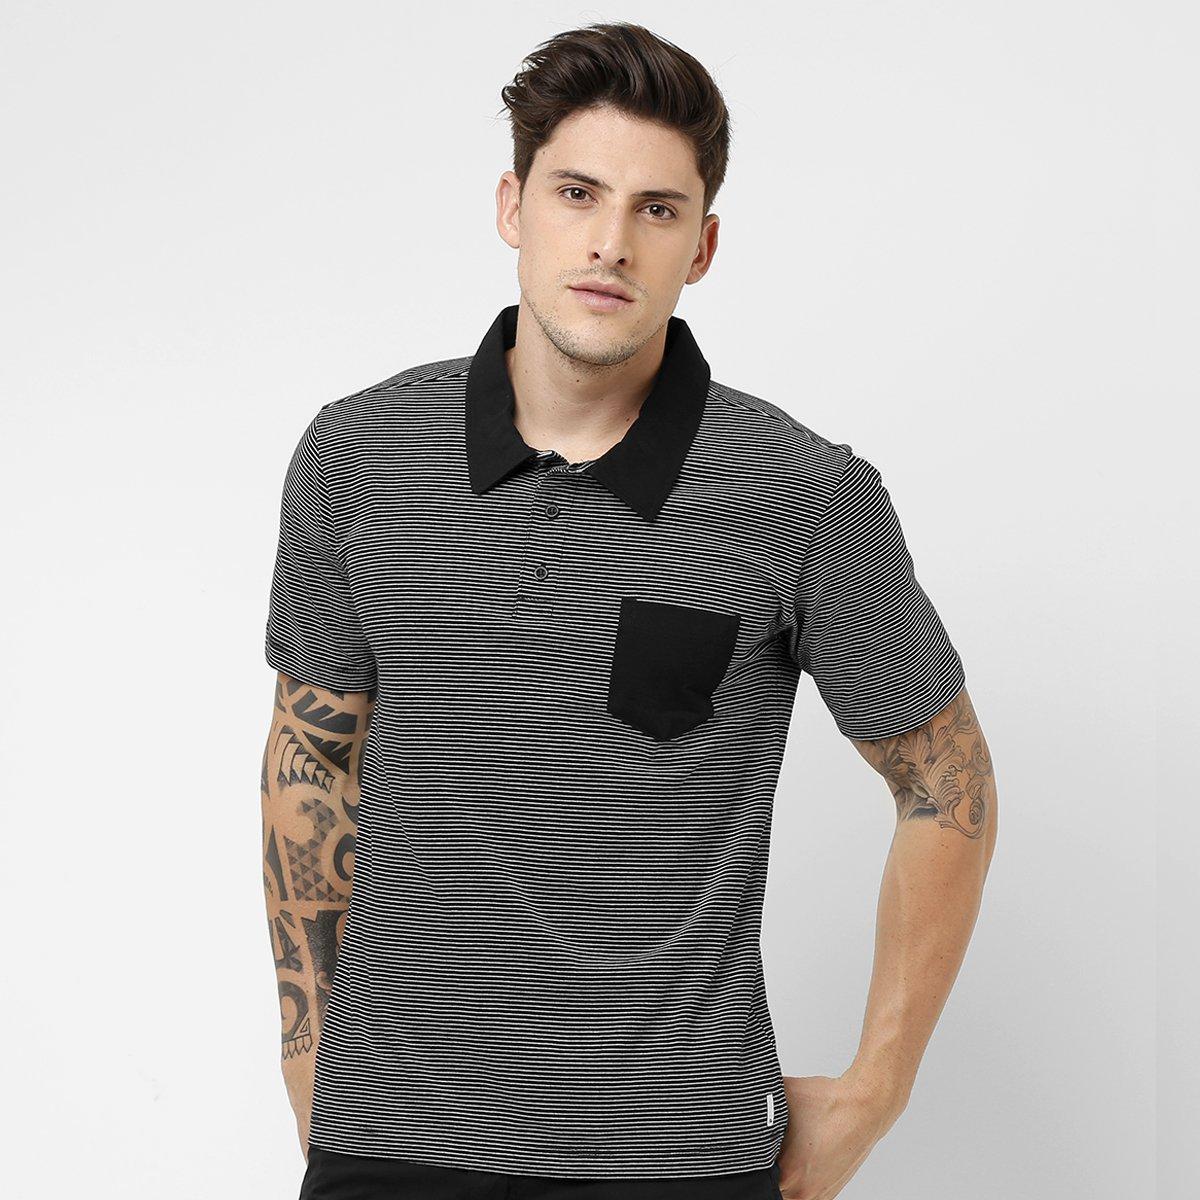 49ac179eea7ef Camisa Polo Quiksilver Stone Crazy - Compre Agora   Netshoes